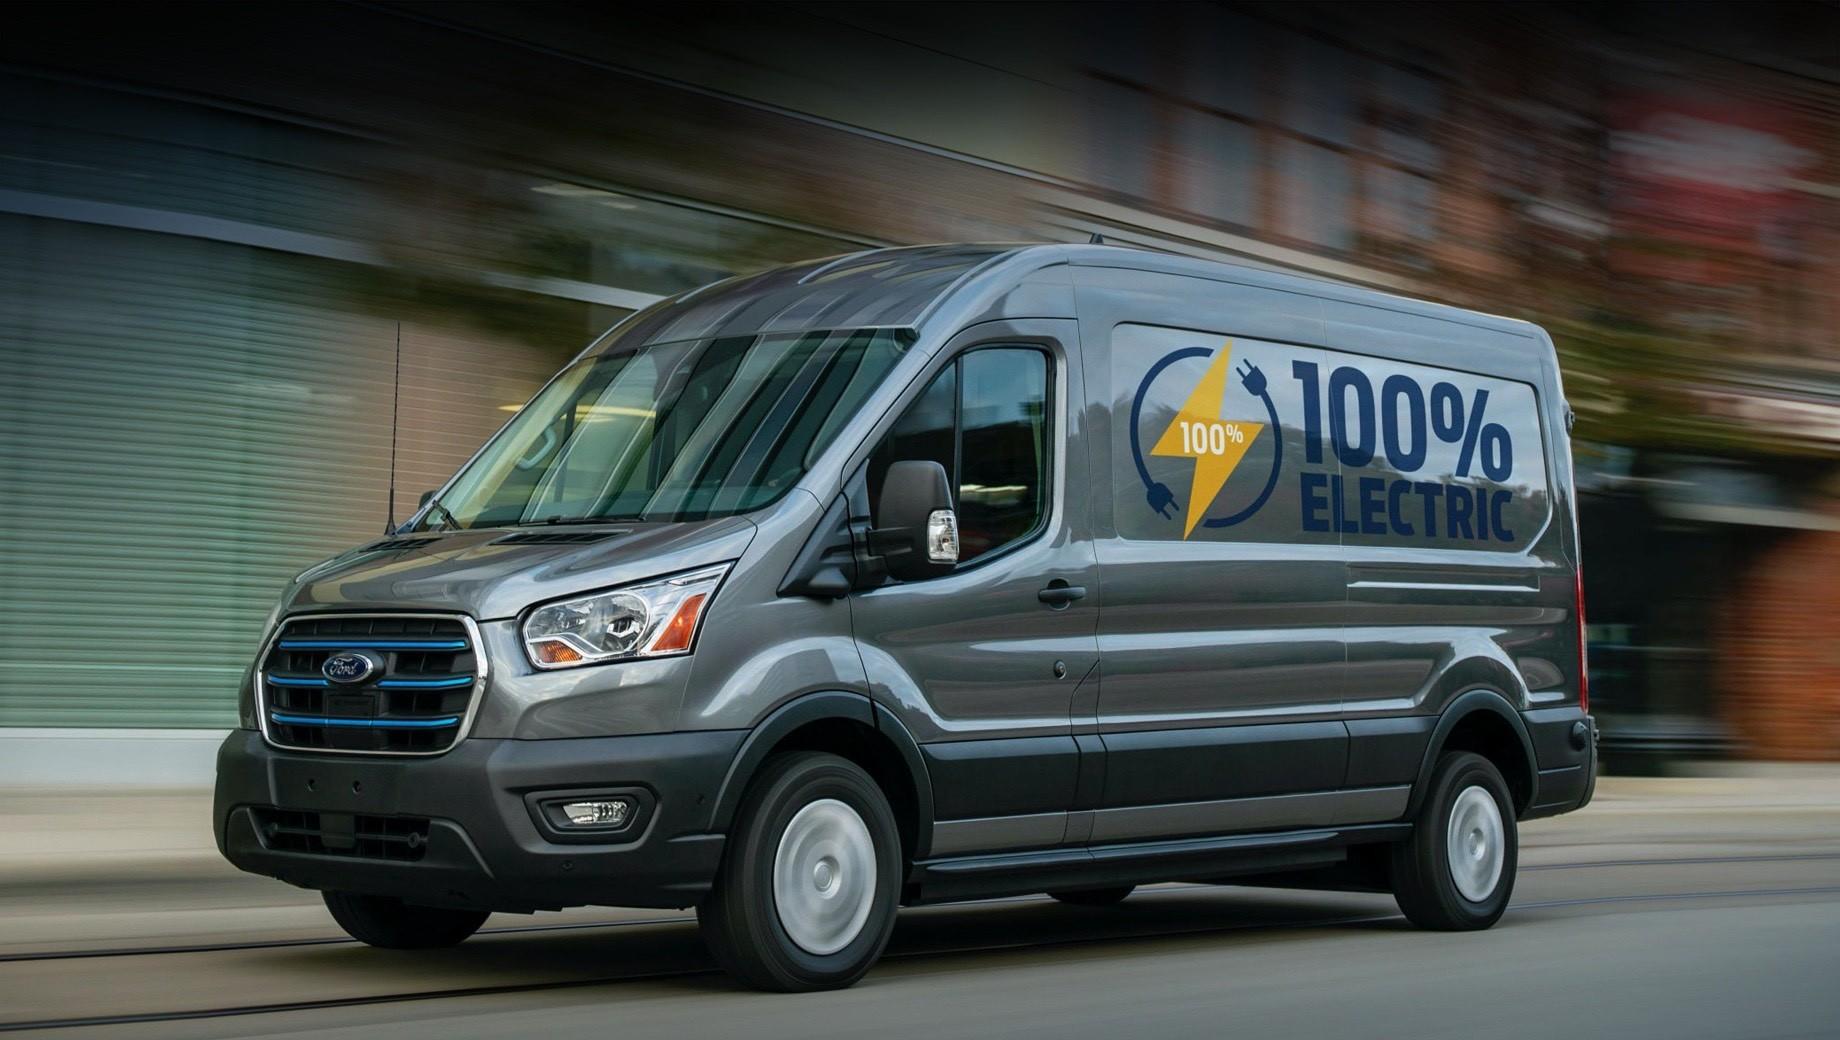 Продажи электрокара Ford E-Transit начнутся в 2022 году